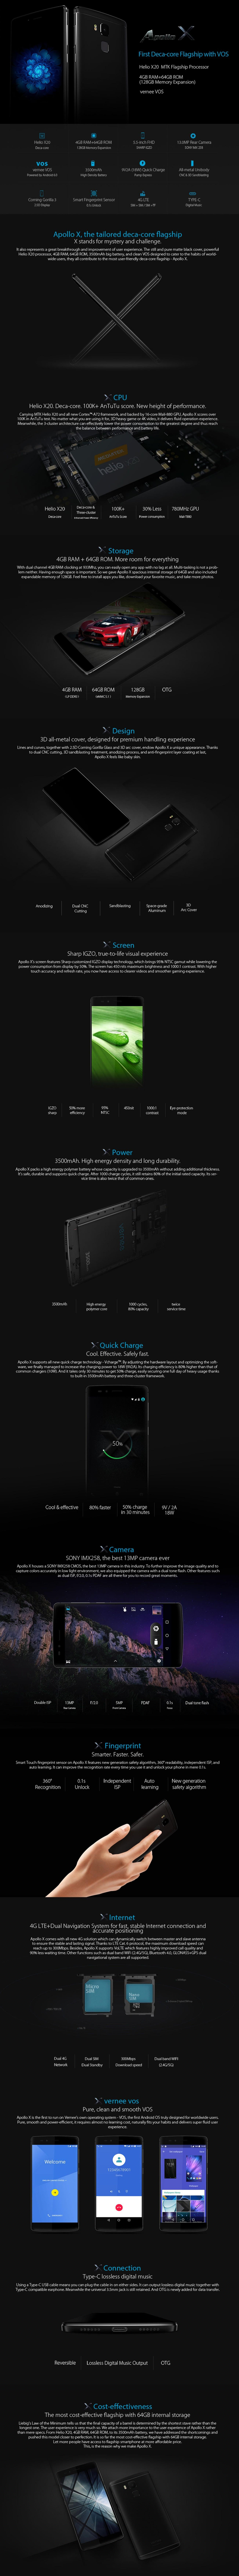 screencapture-vernee-cc-products-apollox-2018-09-25-15_32_14776324dd8de375ca.jpg